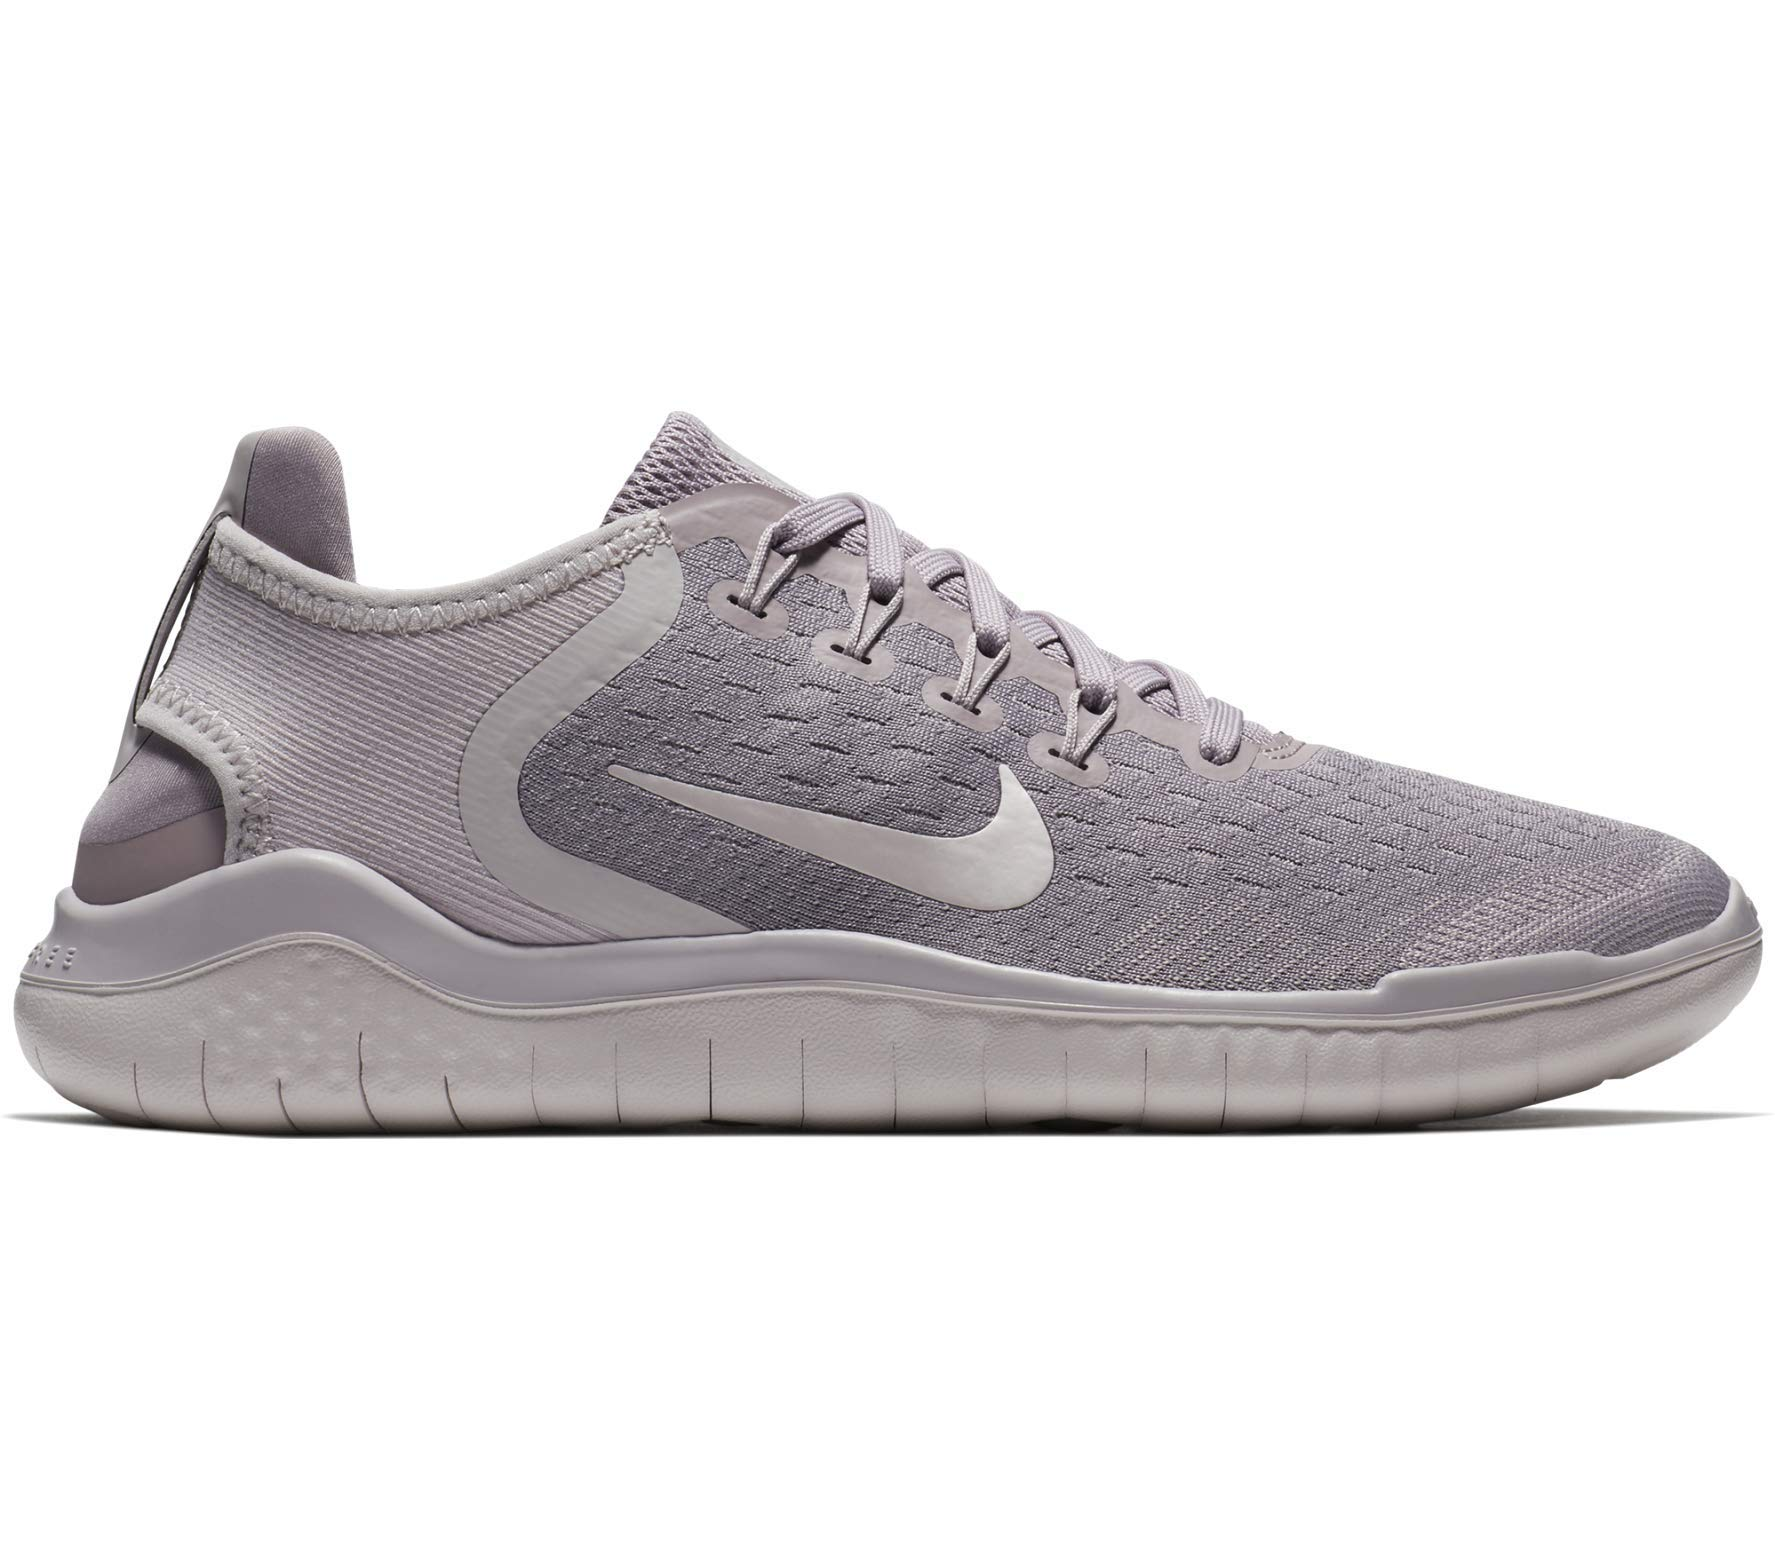 0add277cd94 Galleon - Nike Women s Free RN 2018 Running Shoe (6.5 B(M) US ...